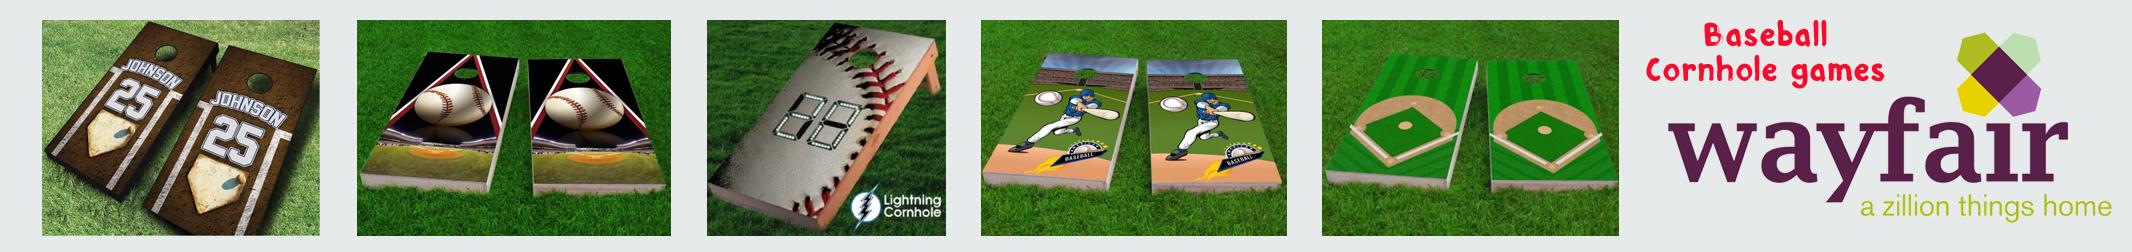 wayfair baseball cornhole games